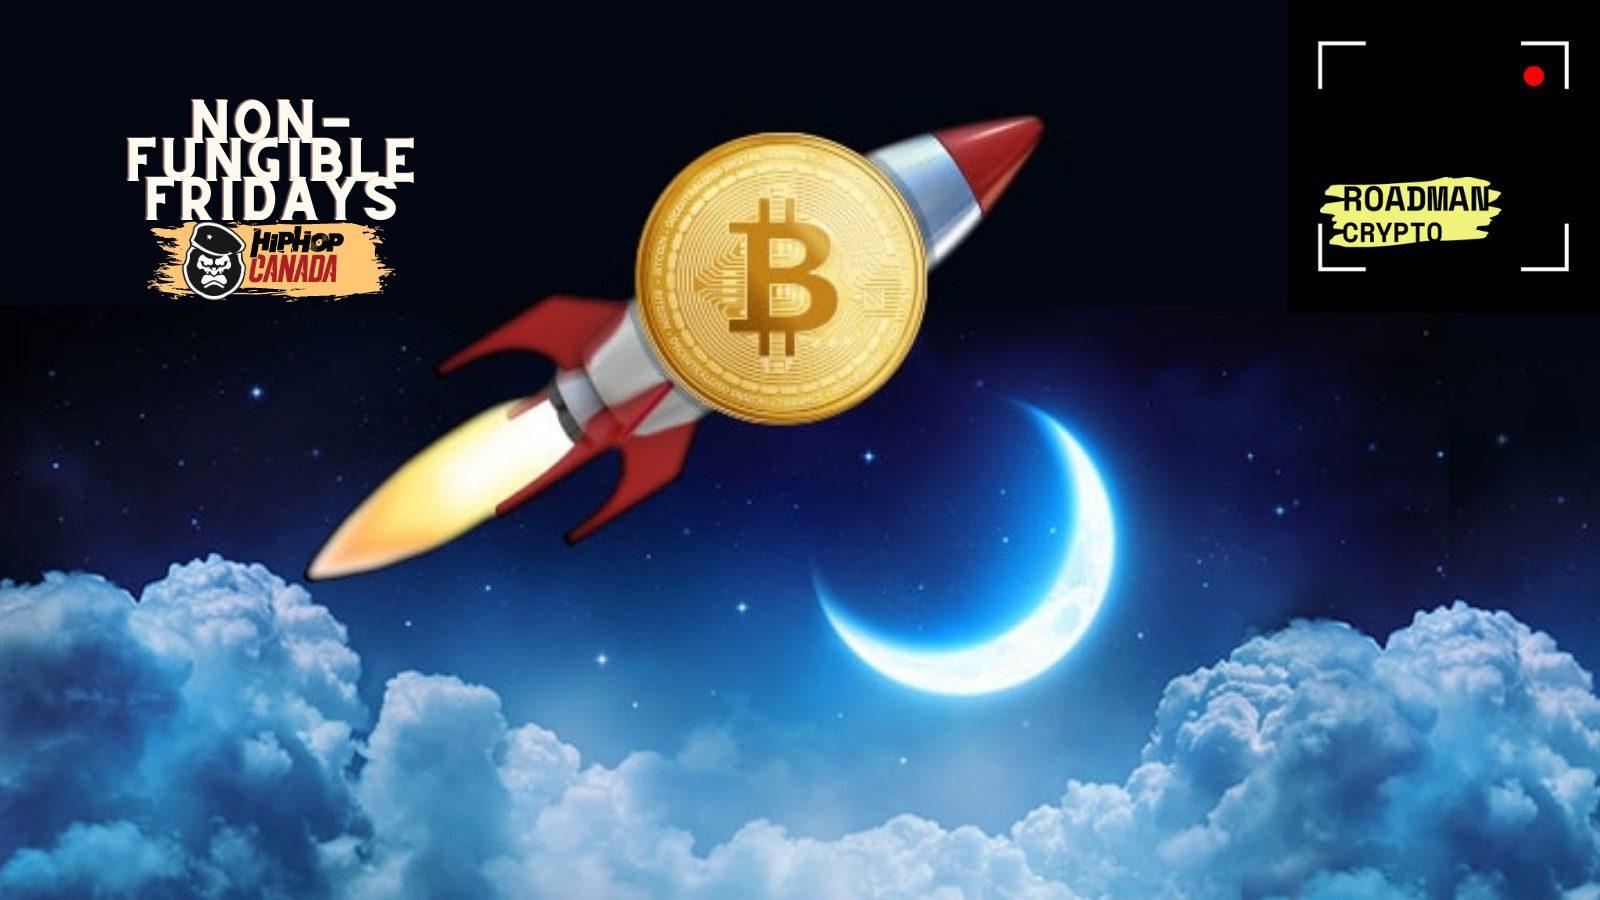 Audio NFT / Non-Fungible Token Fridays! Week #005 with RoadmanCrypto